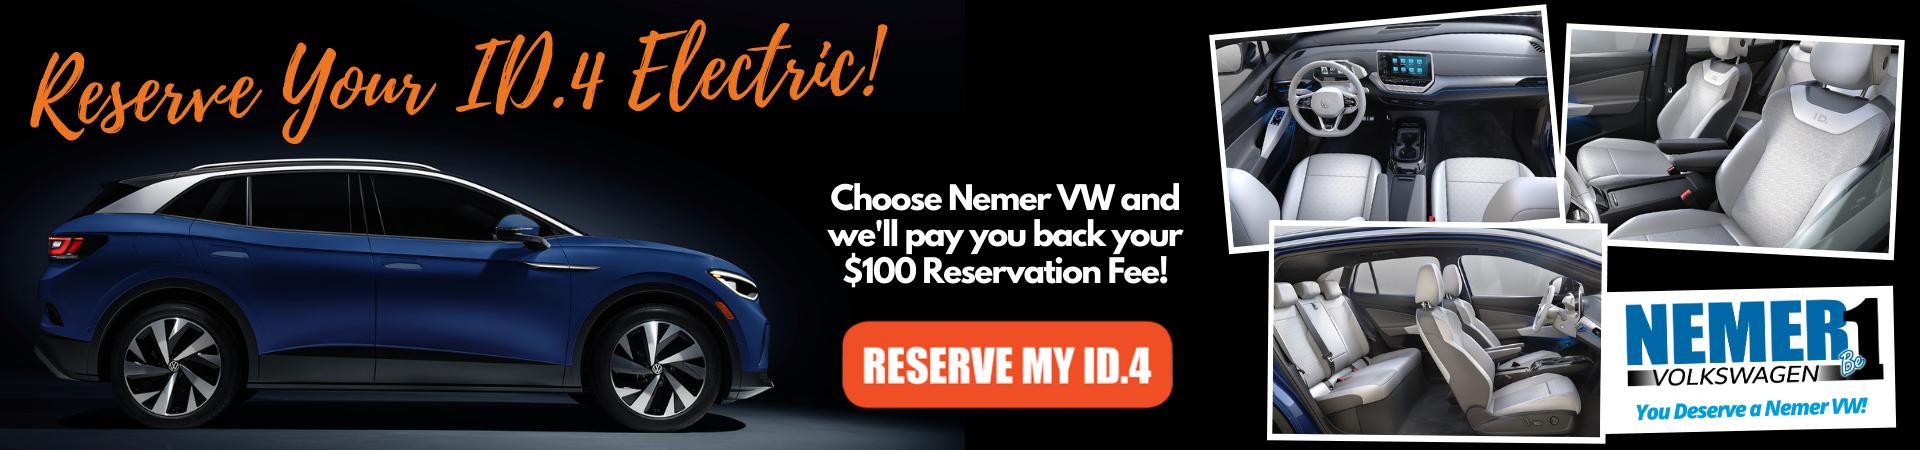 Reserve My ID4